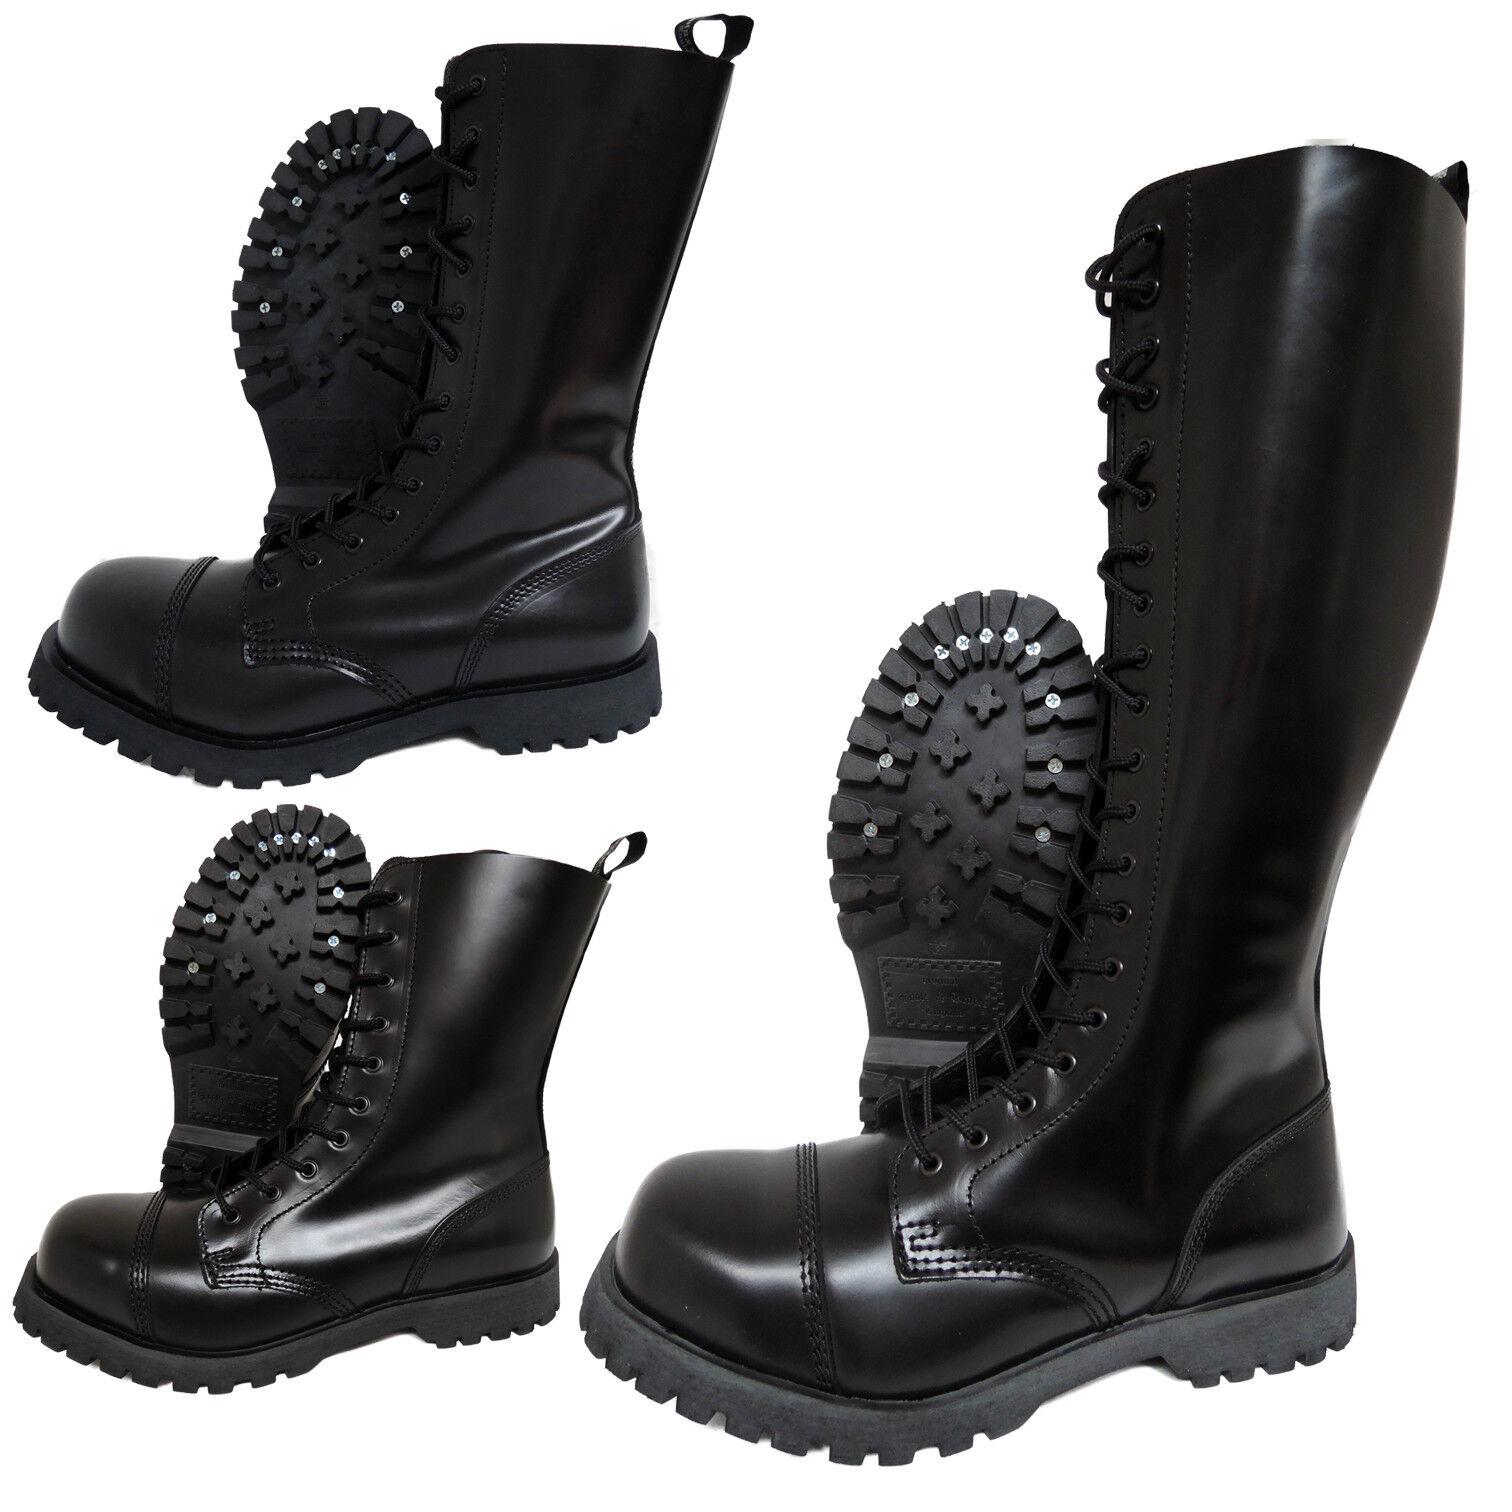 Boots & Braces Black Steel Toe Rangers 10 14 20 Hole Punk Skinhead Biker